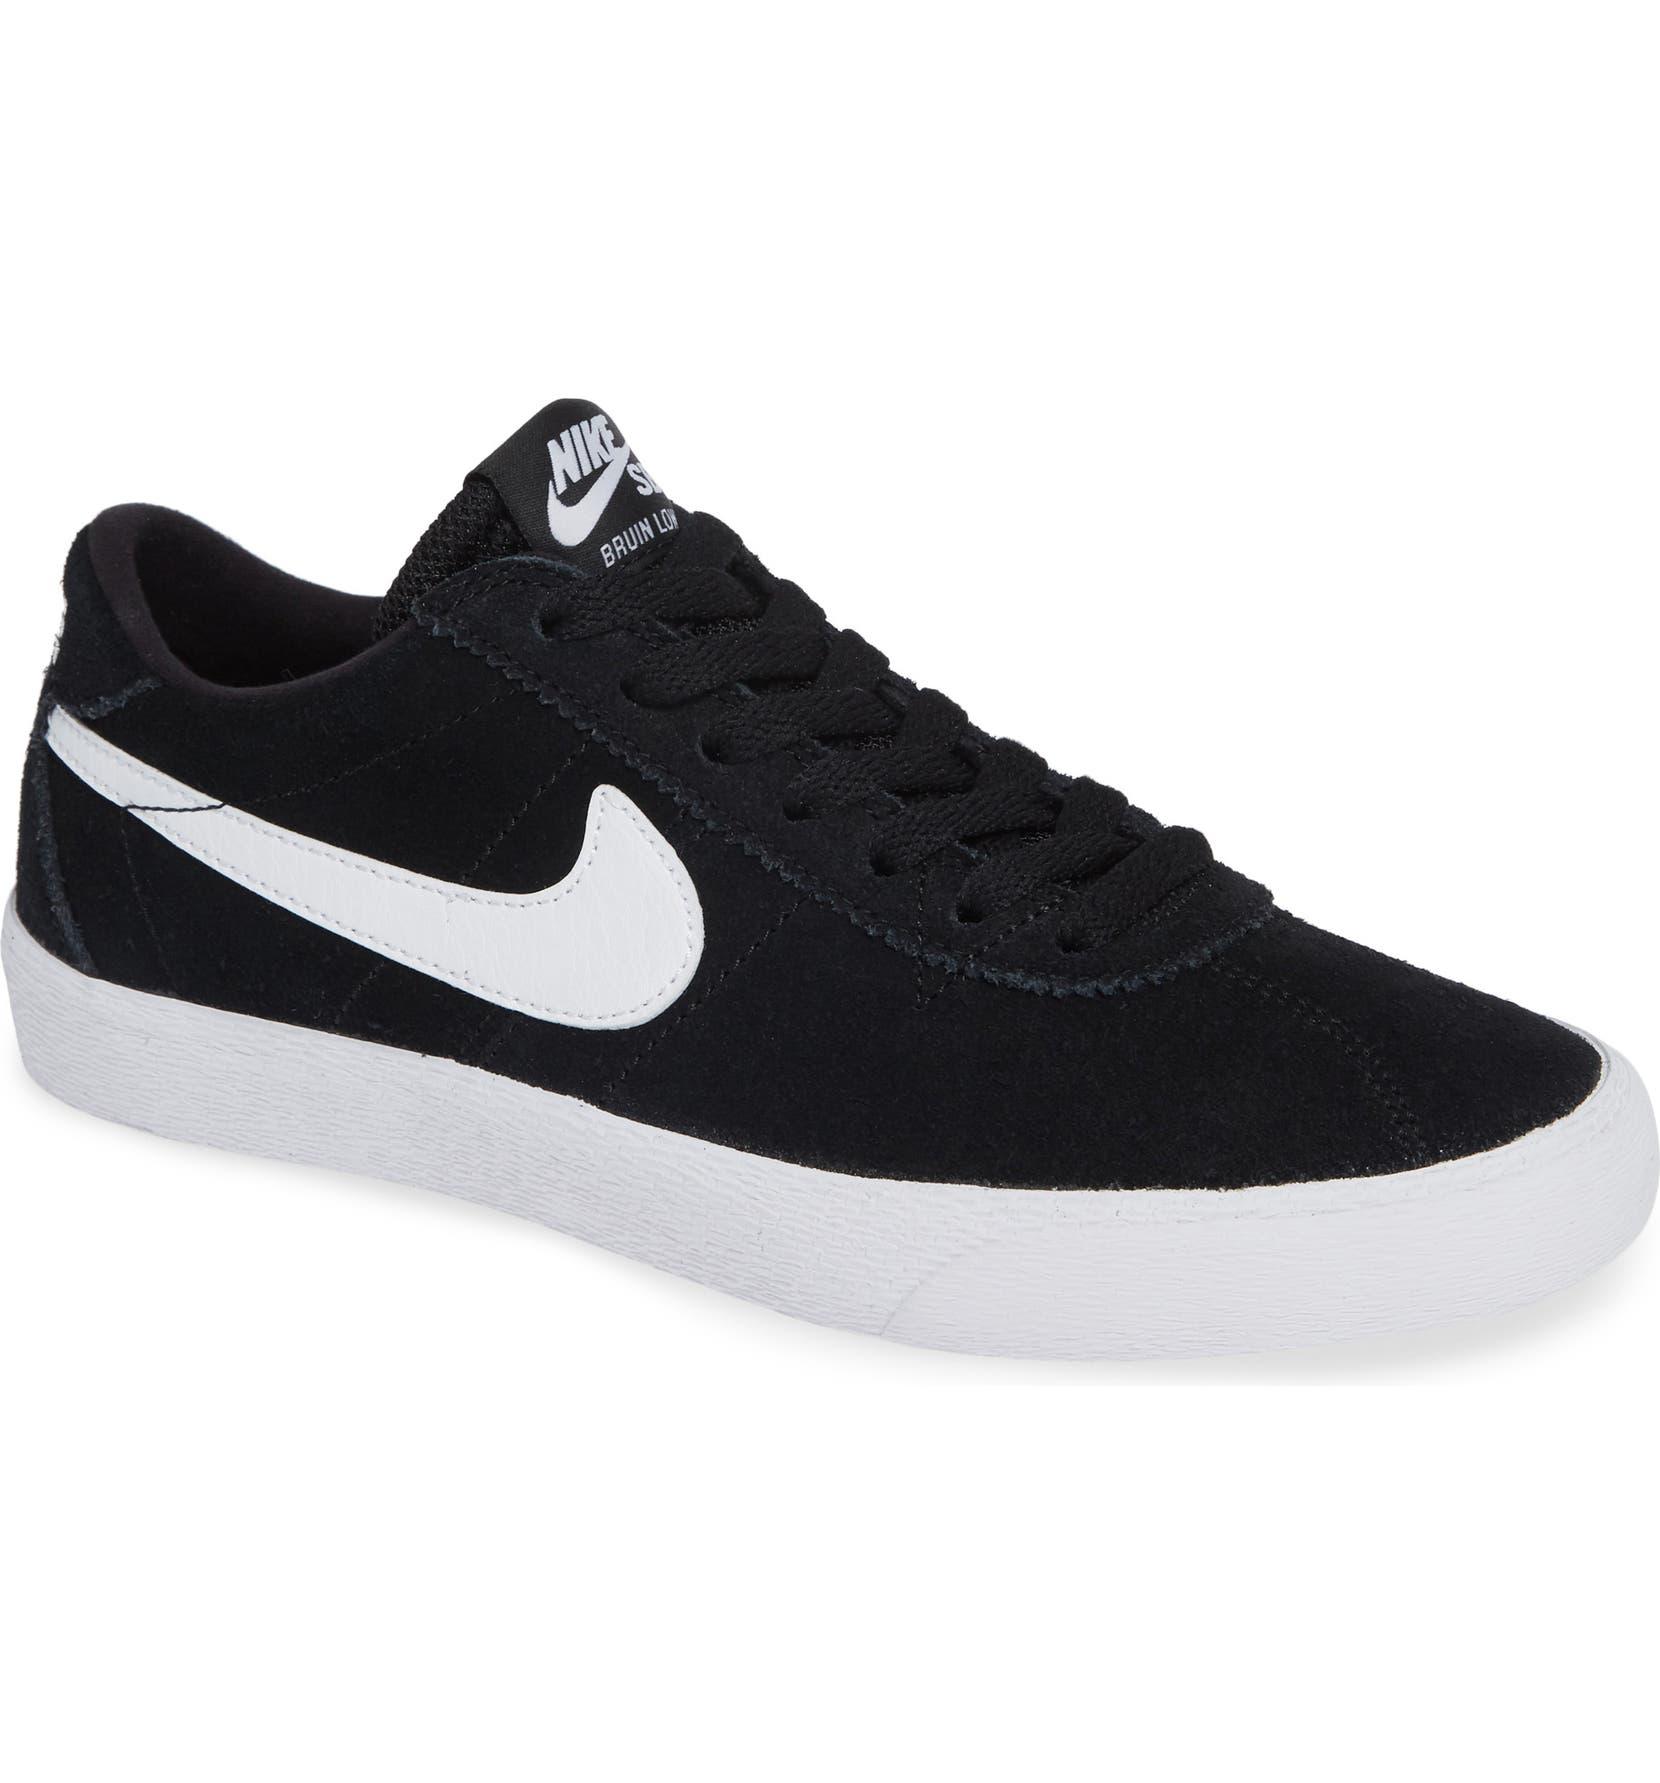 promo code cf31b 4e04f Nike SB Bruin Low Skateboarding Sneaker (Women)  Nordstrom